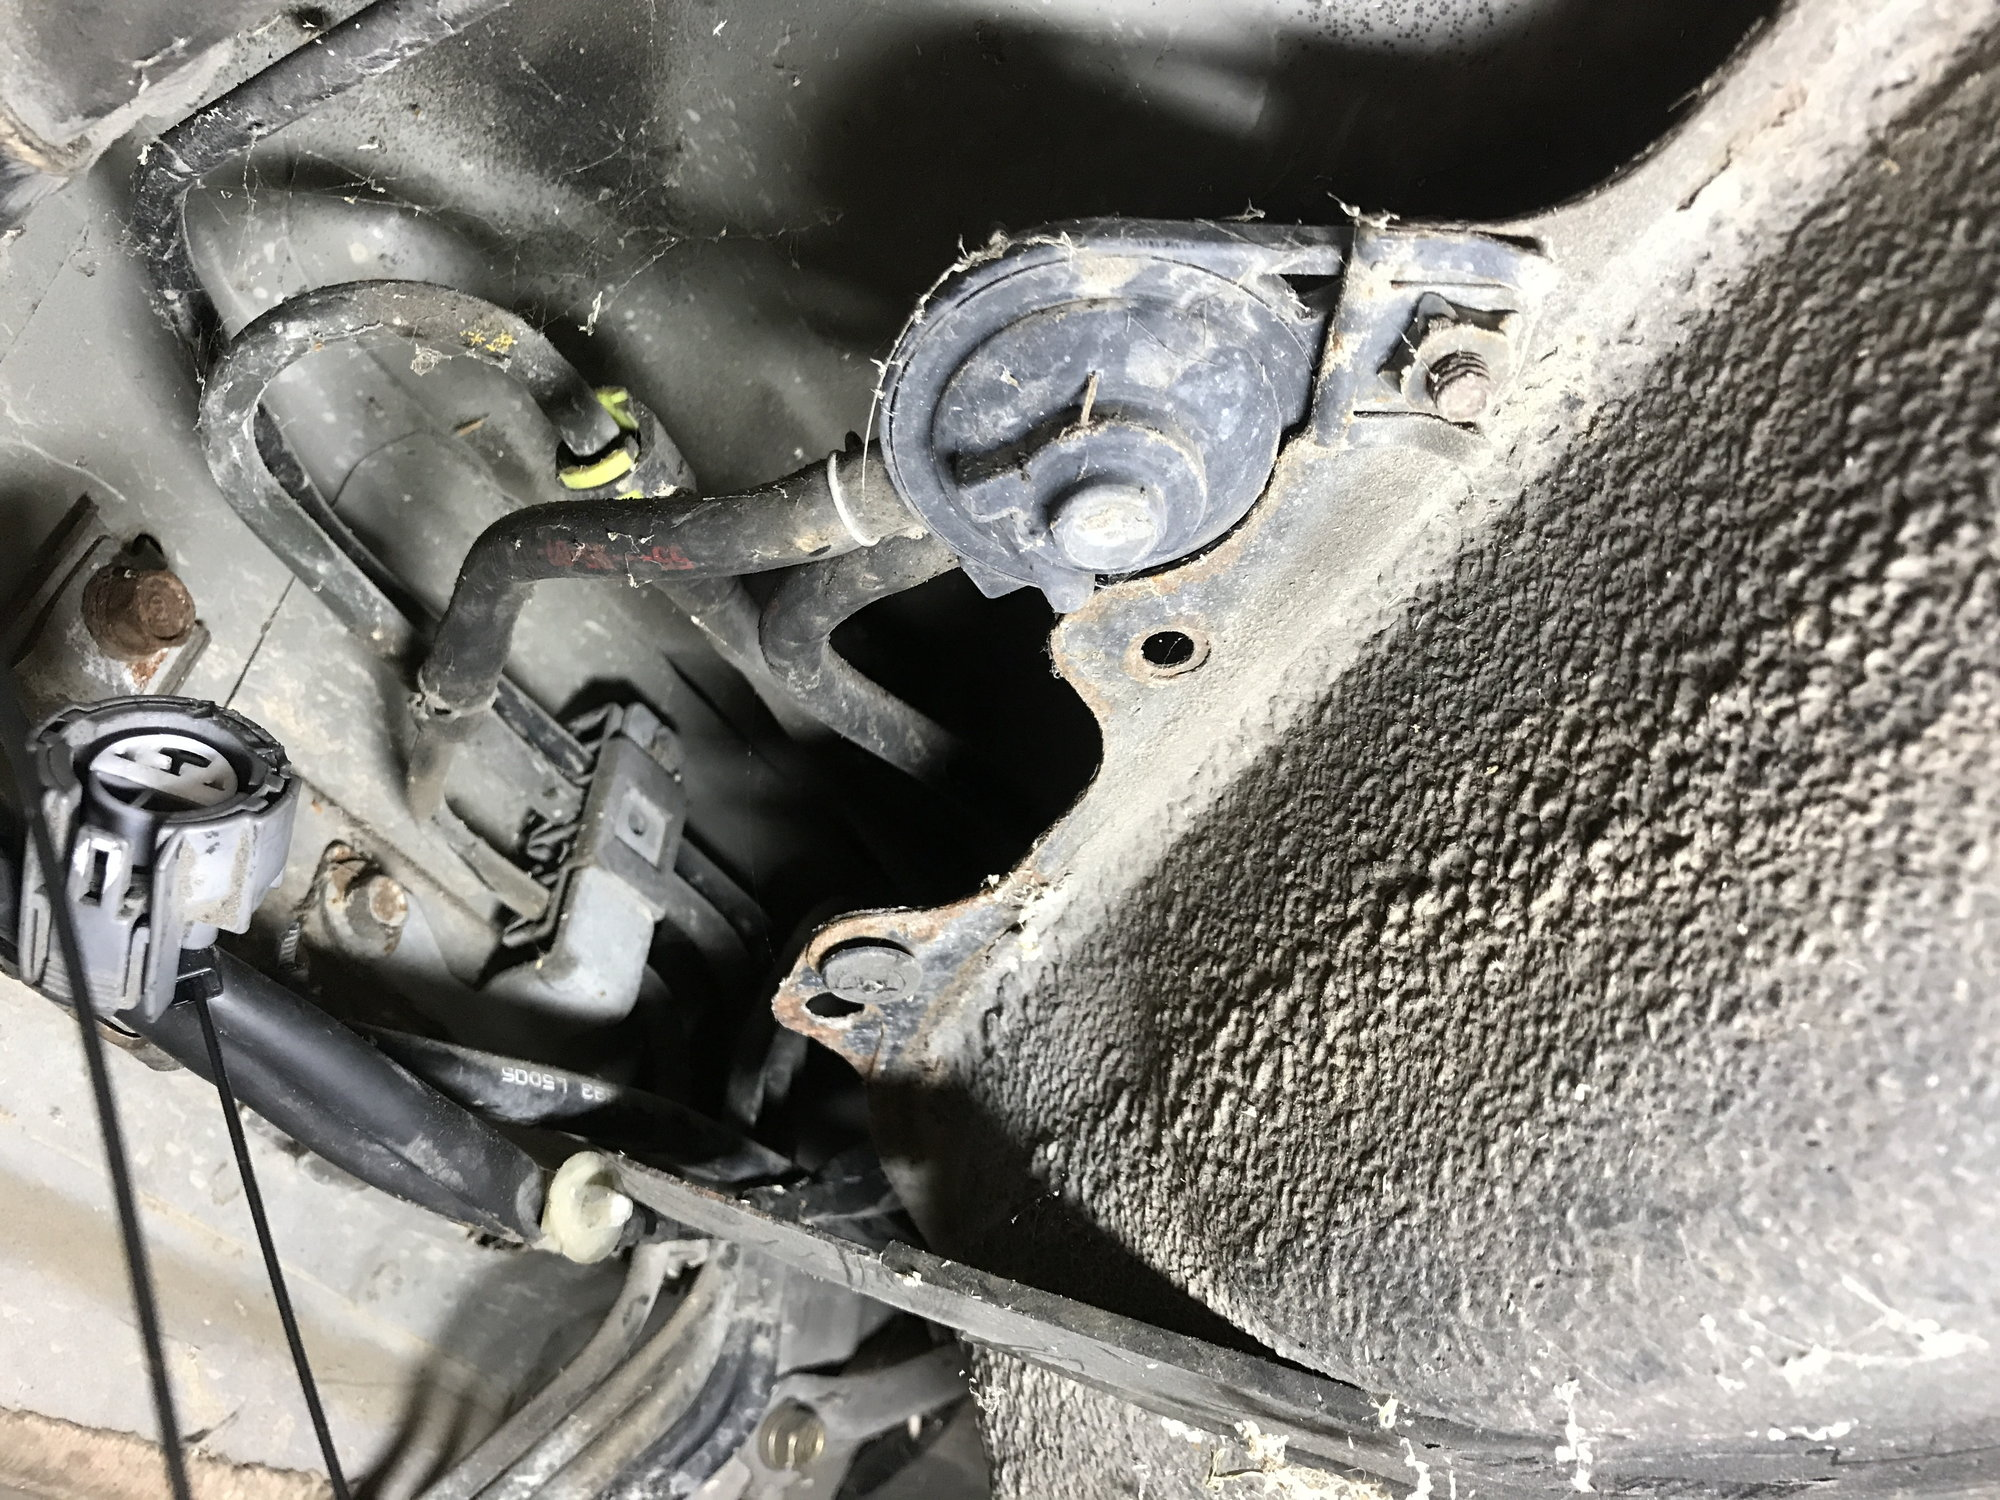 1996 Integra fuel pump wiring question. - Honda-Tech ...